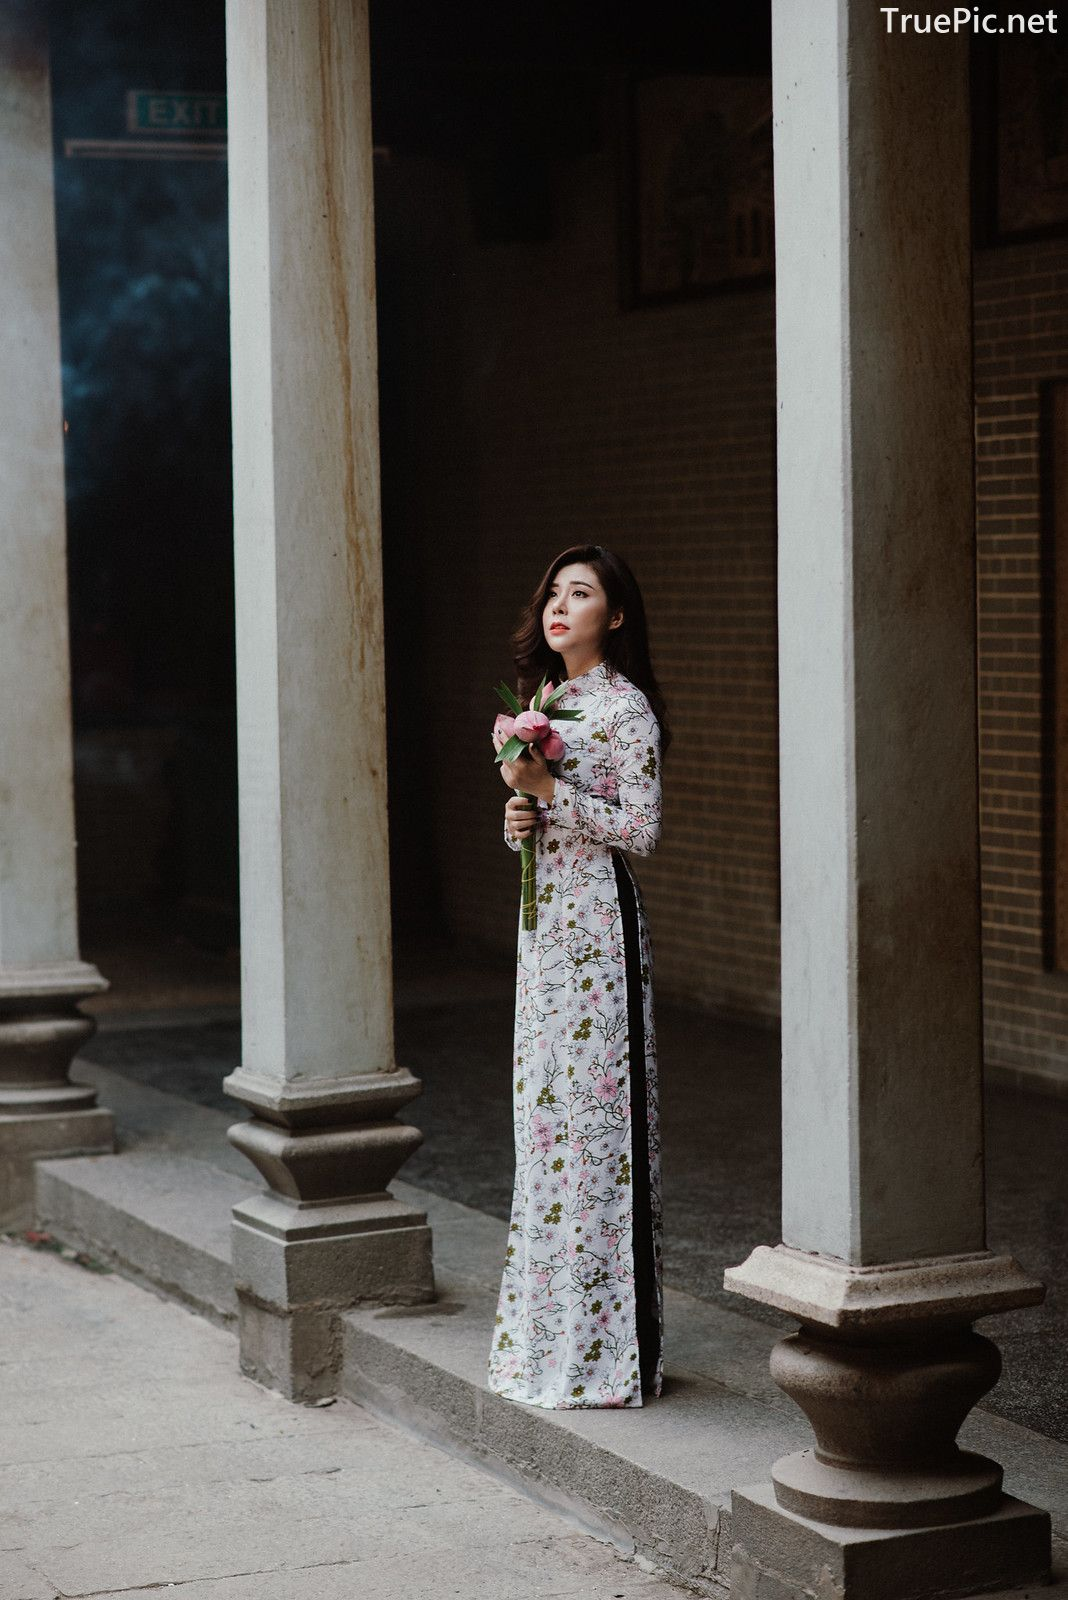 Image-Vietnamese-Beautiful-Girl-Ao-Dai-Vietnam-Traditional-Dress-by-VIN-Photo-3-TruePic.net- Picture-9